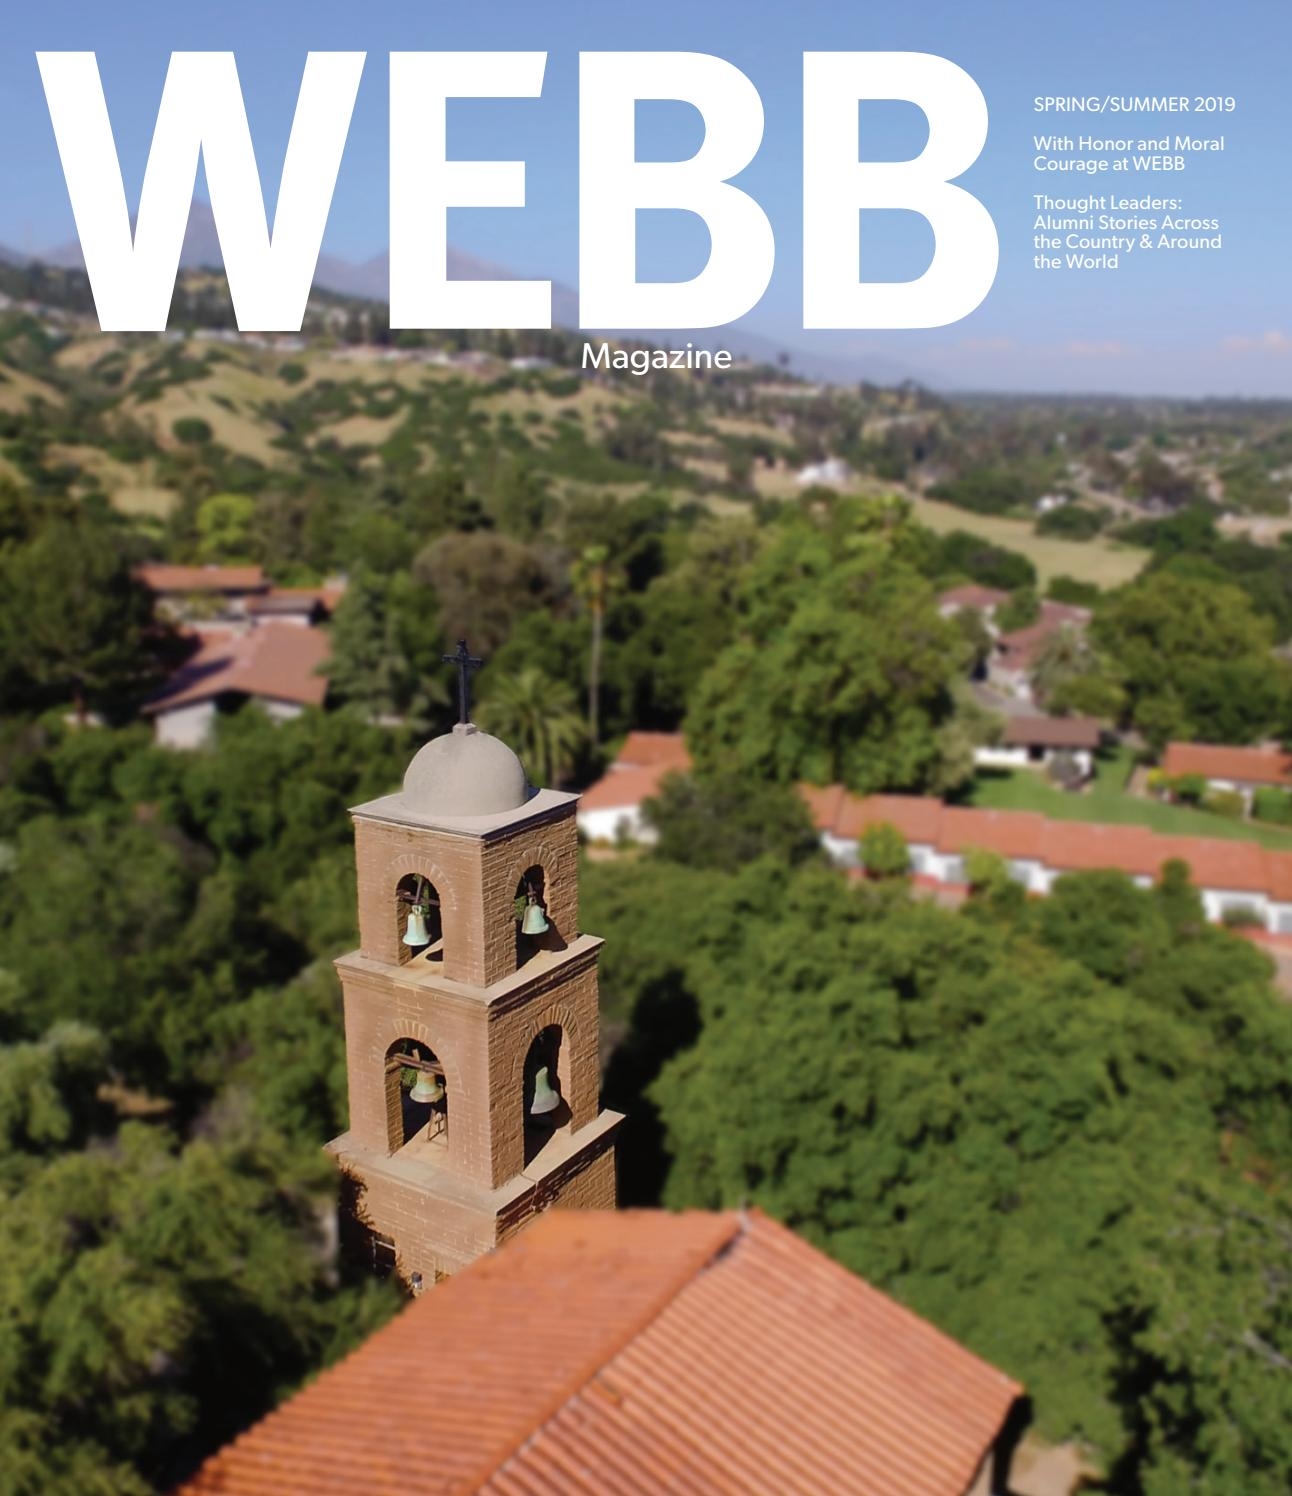 WEBB Magazine Spring Summer 2019 by The Webb Schools - issuu